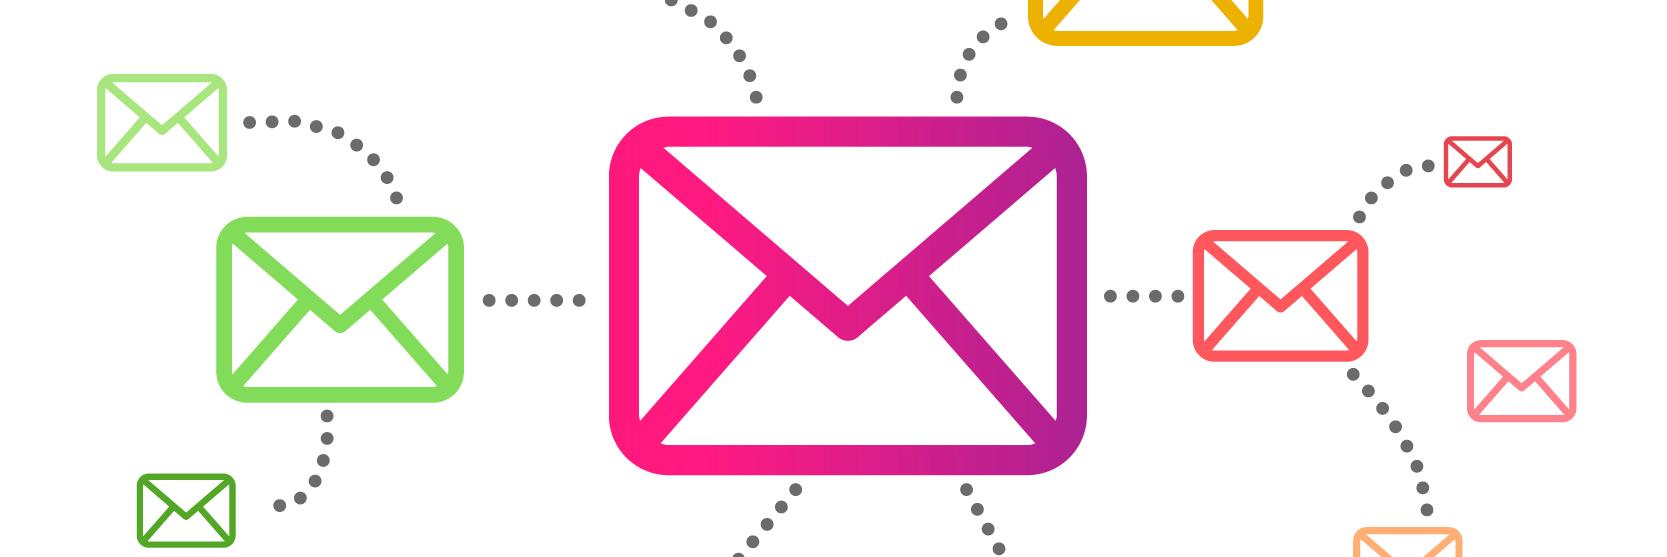 Behavioral Email